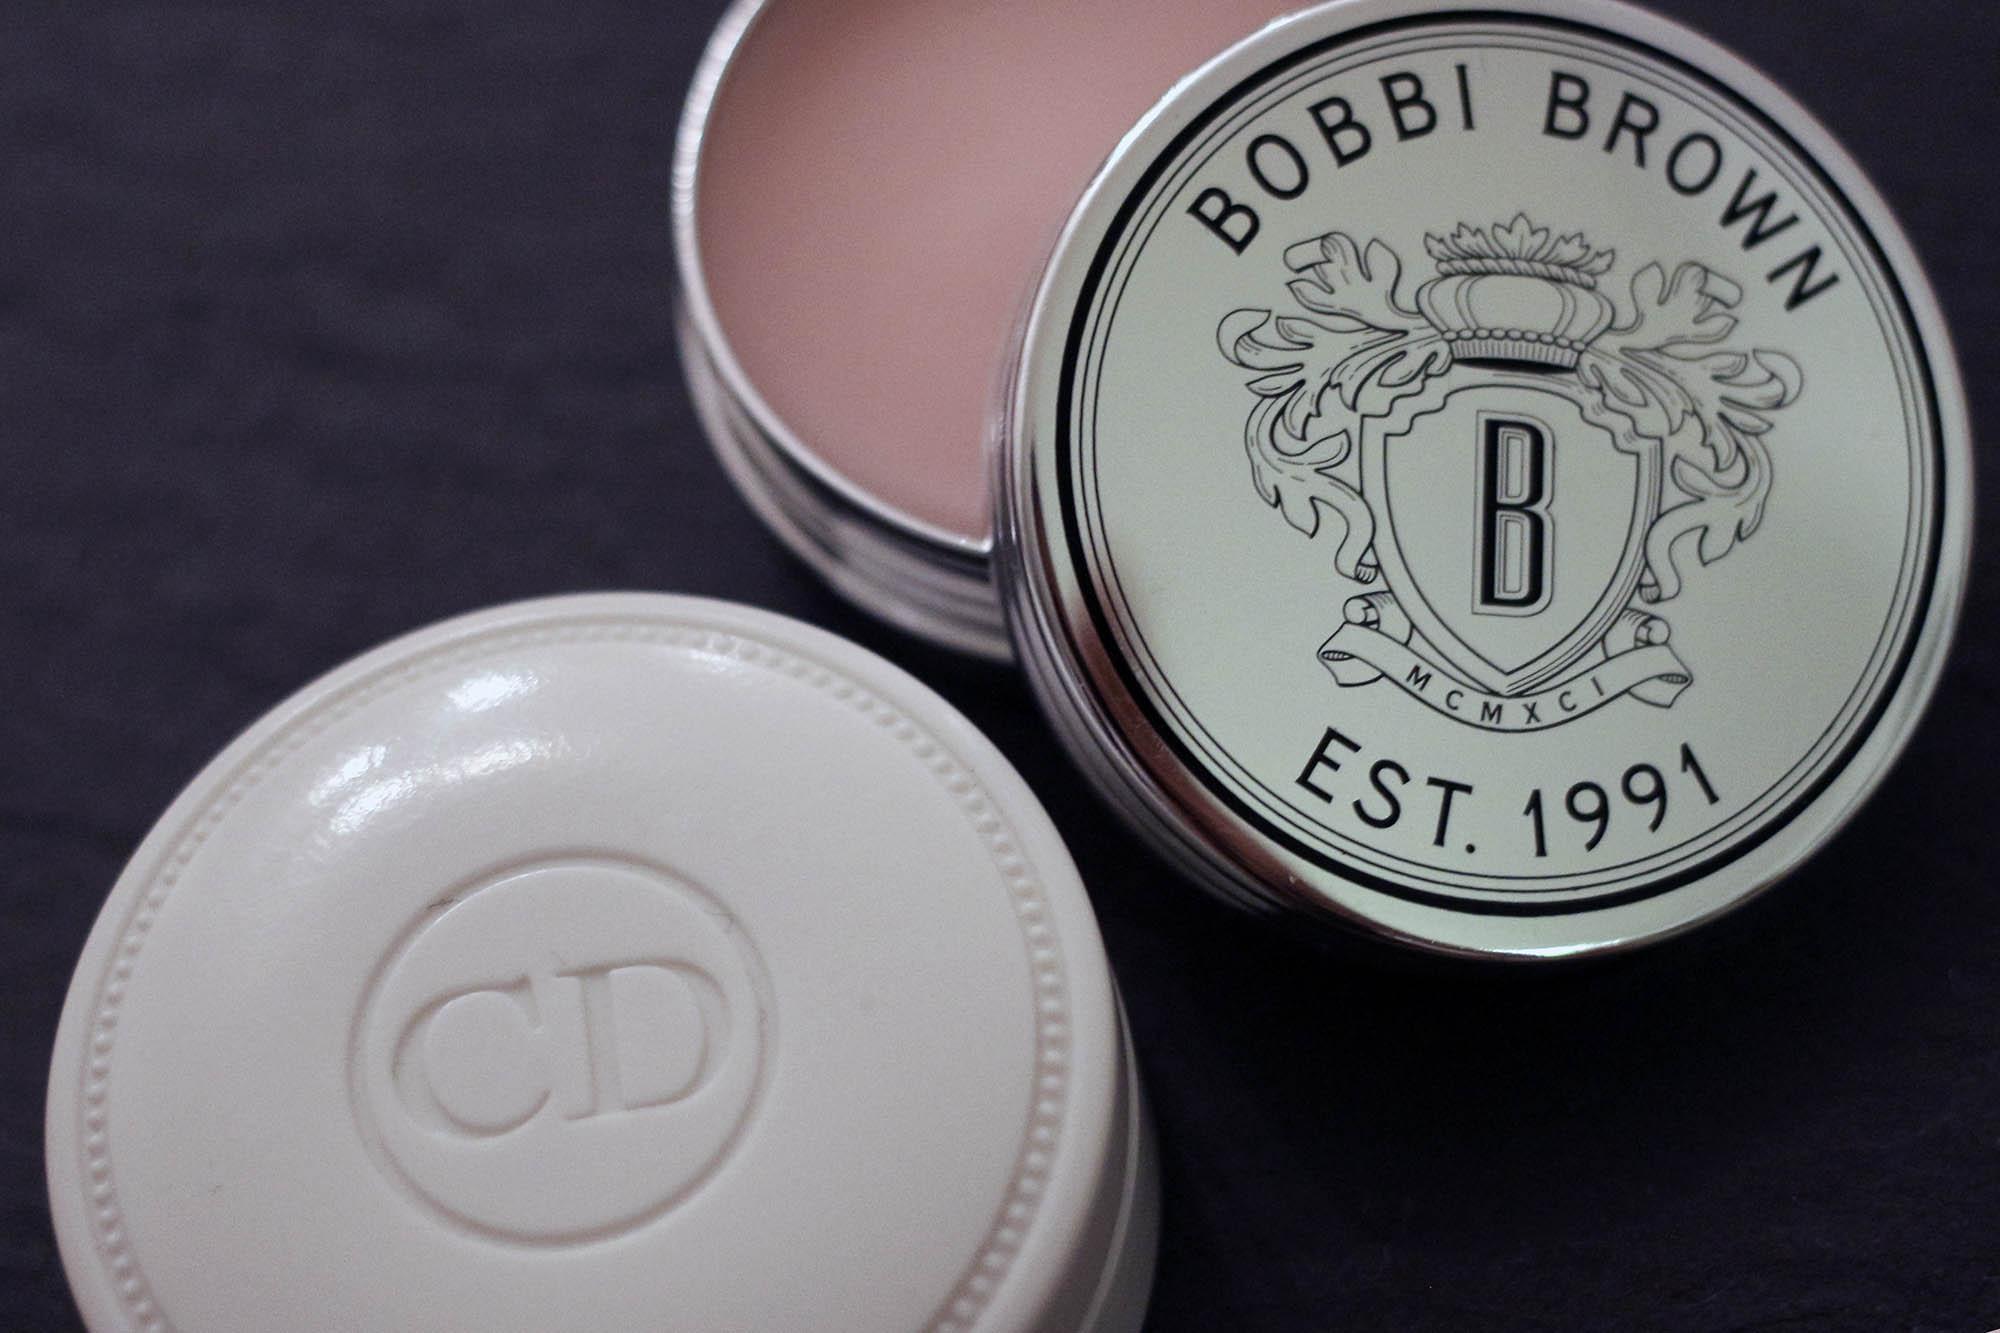 BOBBI BROWN Lipbalm_03